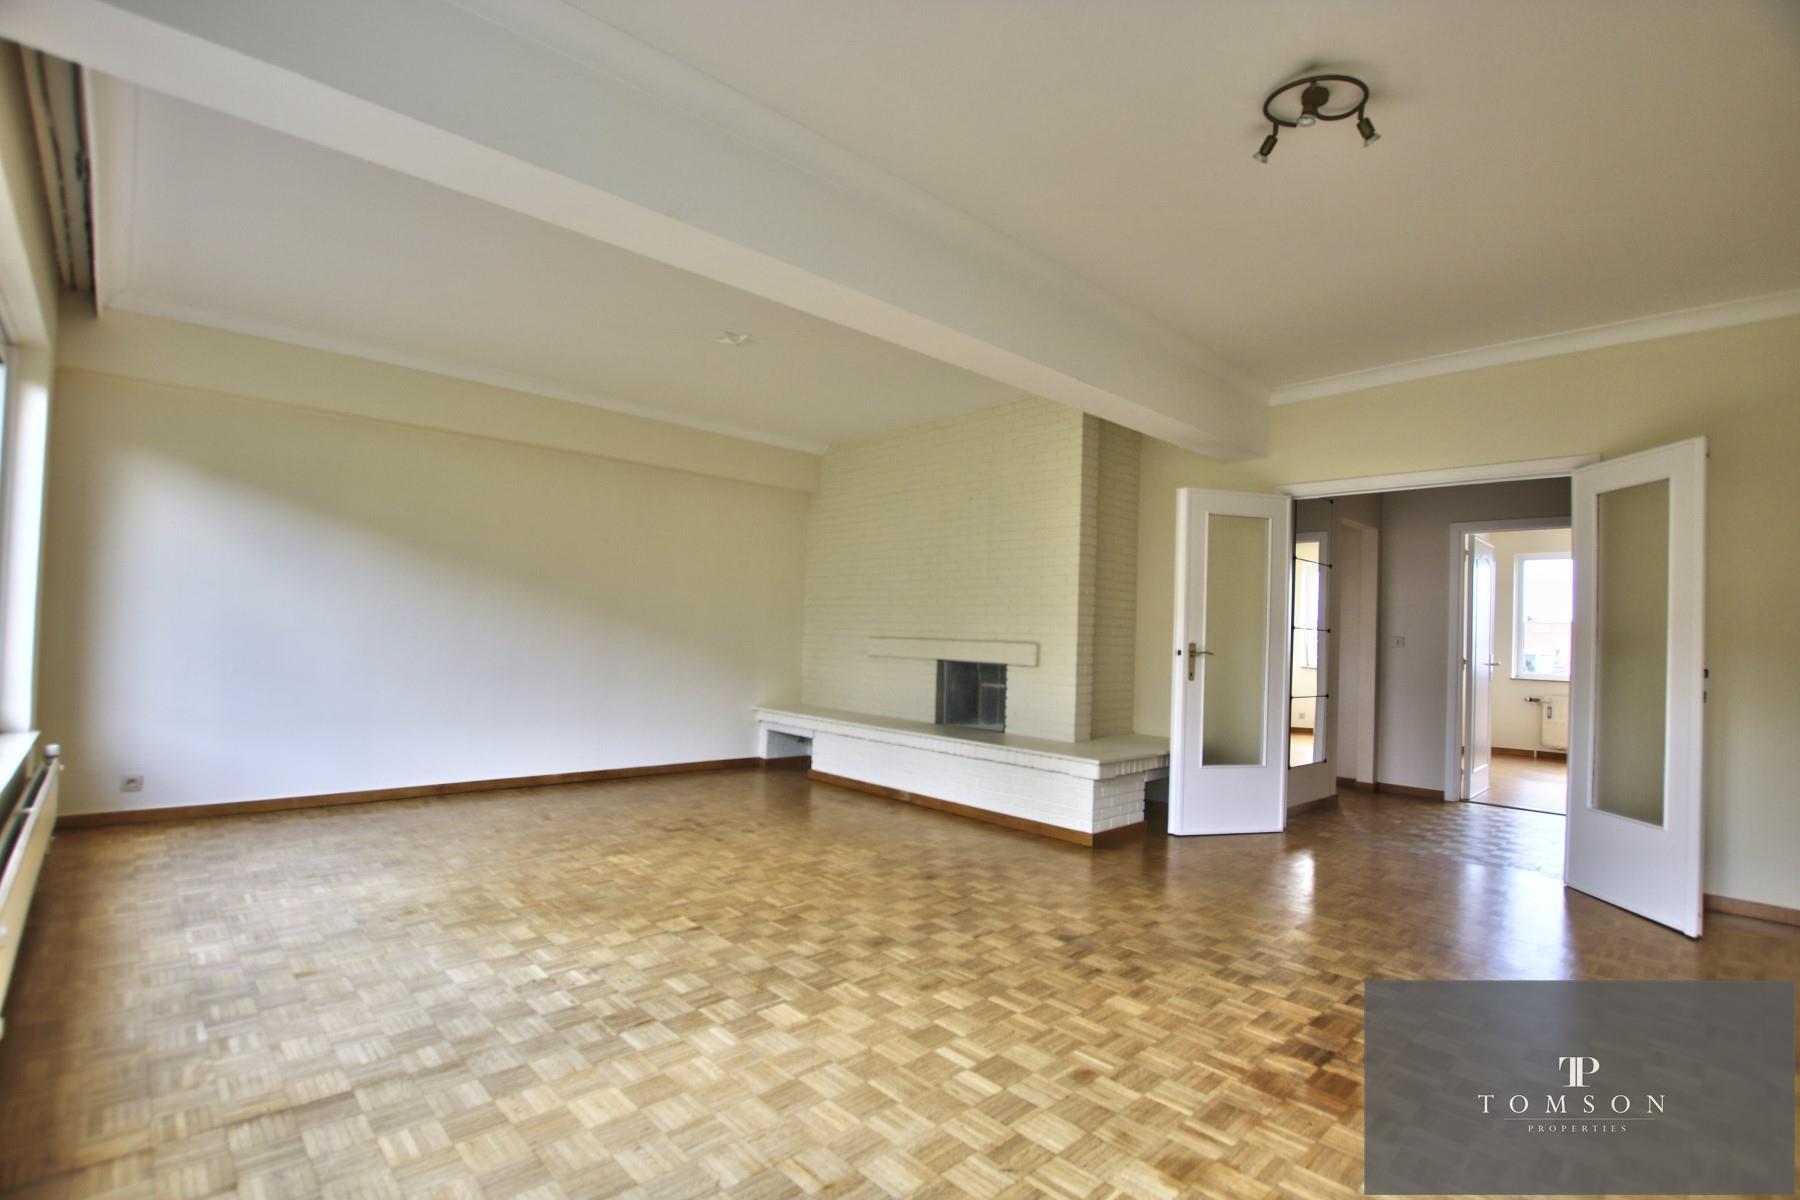 Flat - Etterbeek - #4496041-2